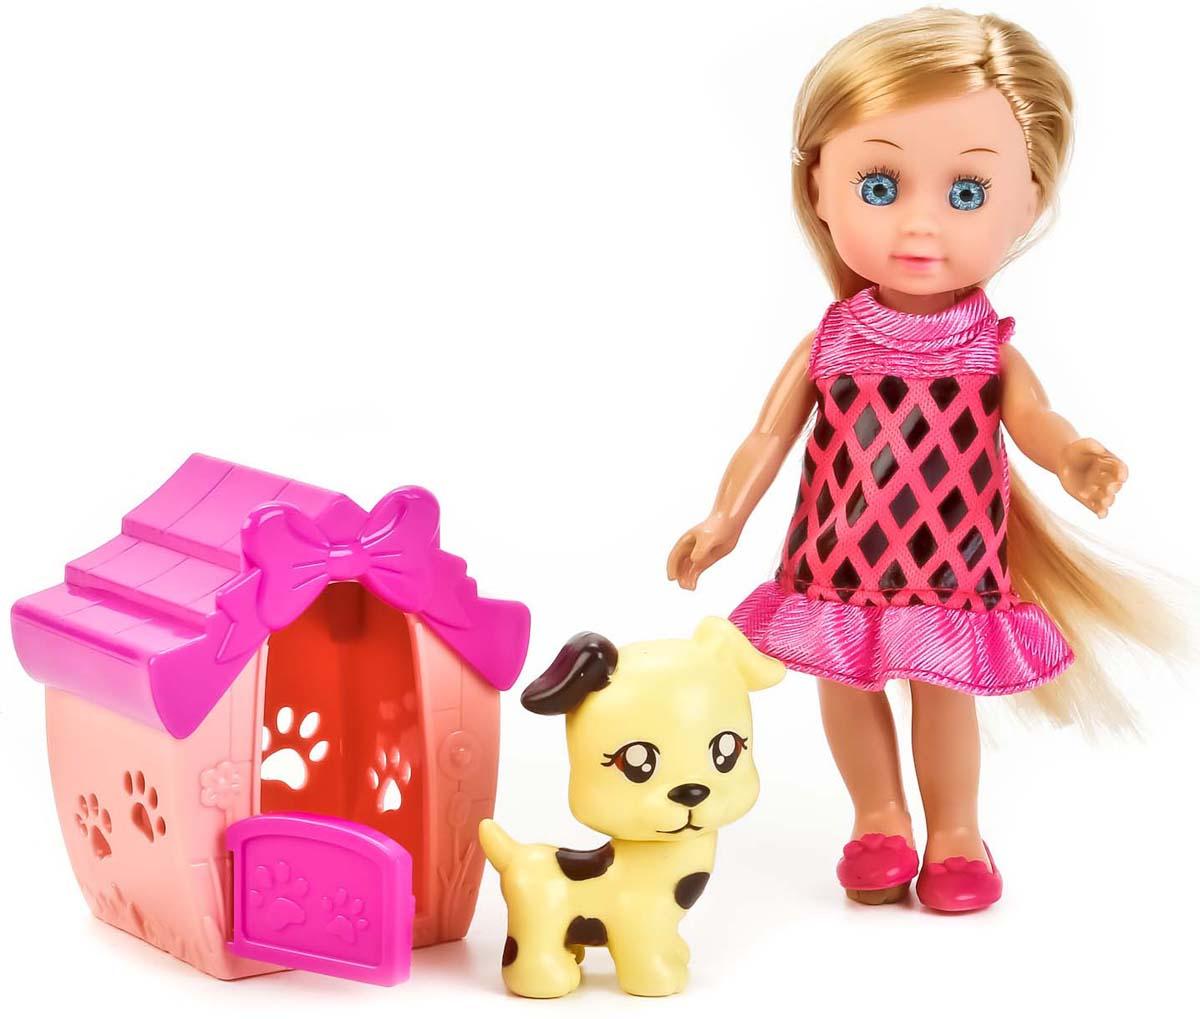 Карапуз Кукла Hello Kitty Машенька с питомцем кукла кана из серии джуку